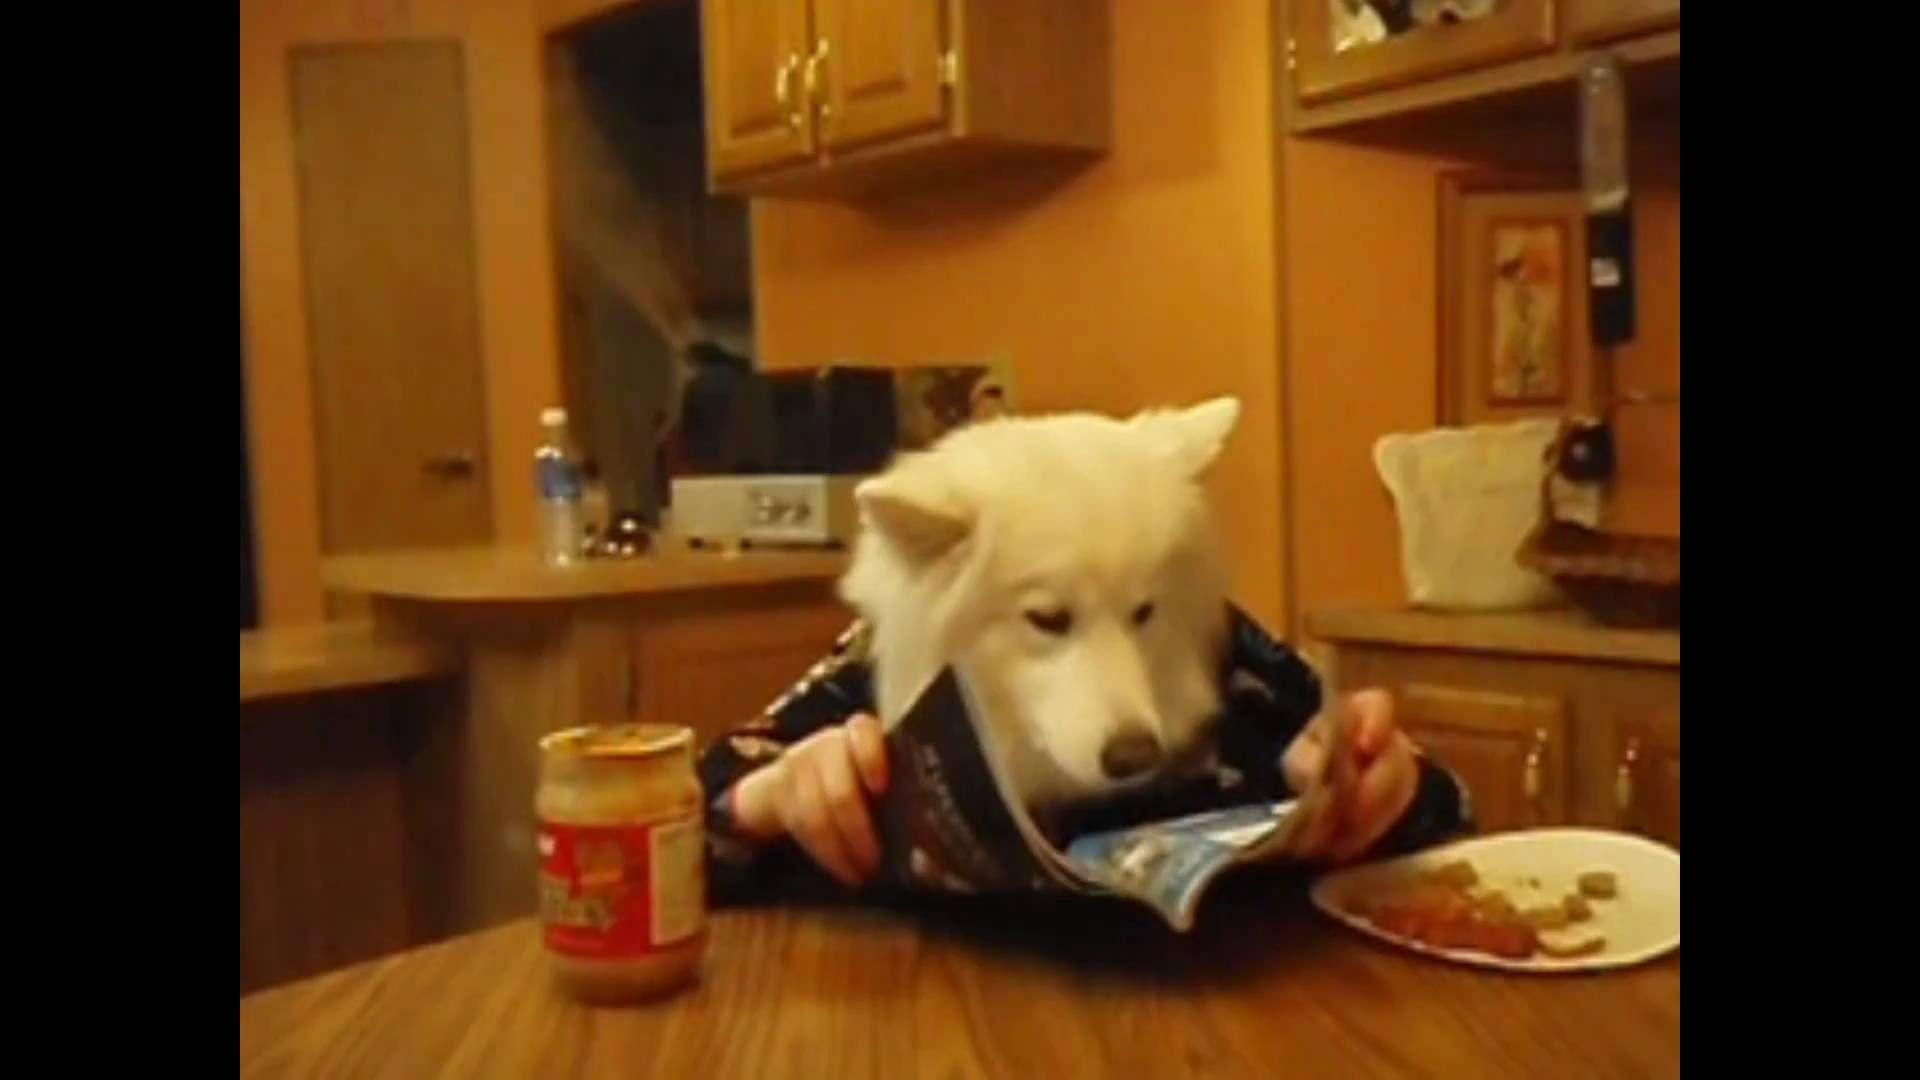 Samoyed Eats At Table Dog With Human Hands Samoyed Dog Eating Dogs